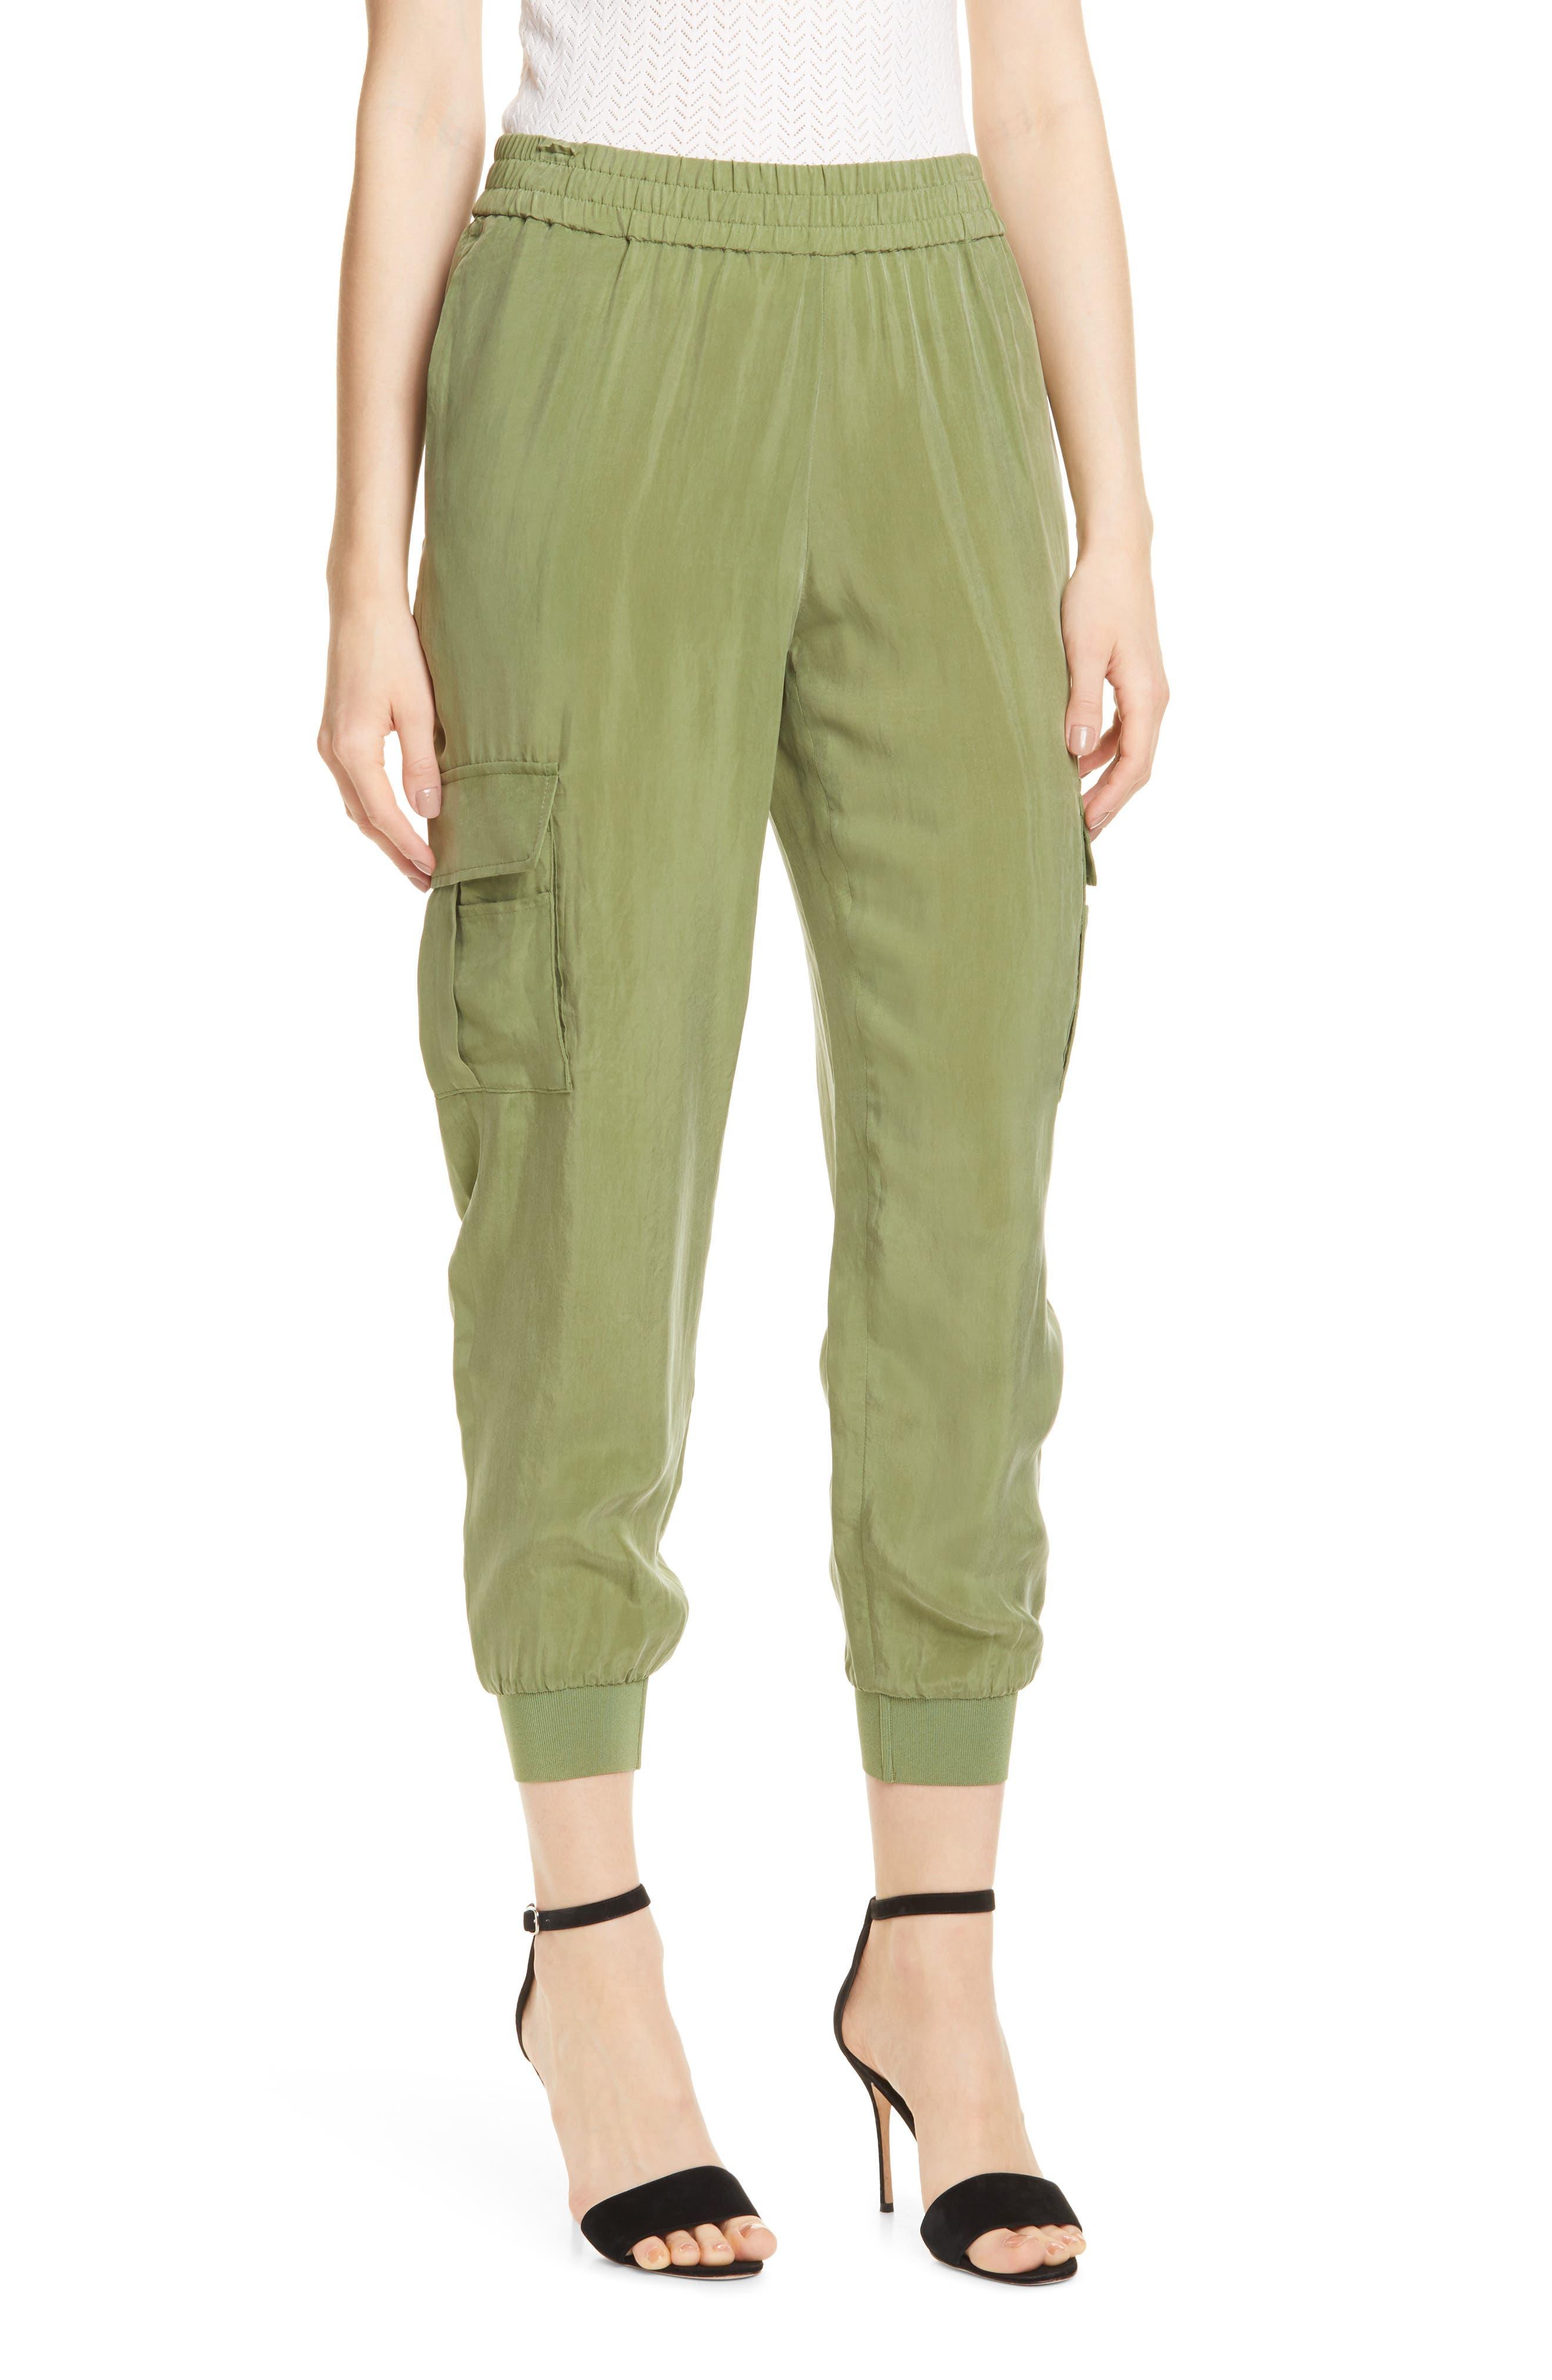 Alice + Olivia Dede Cargo Jogger Pants, Green